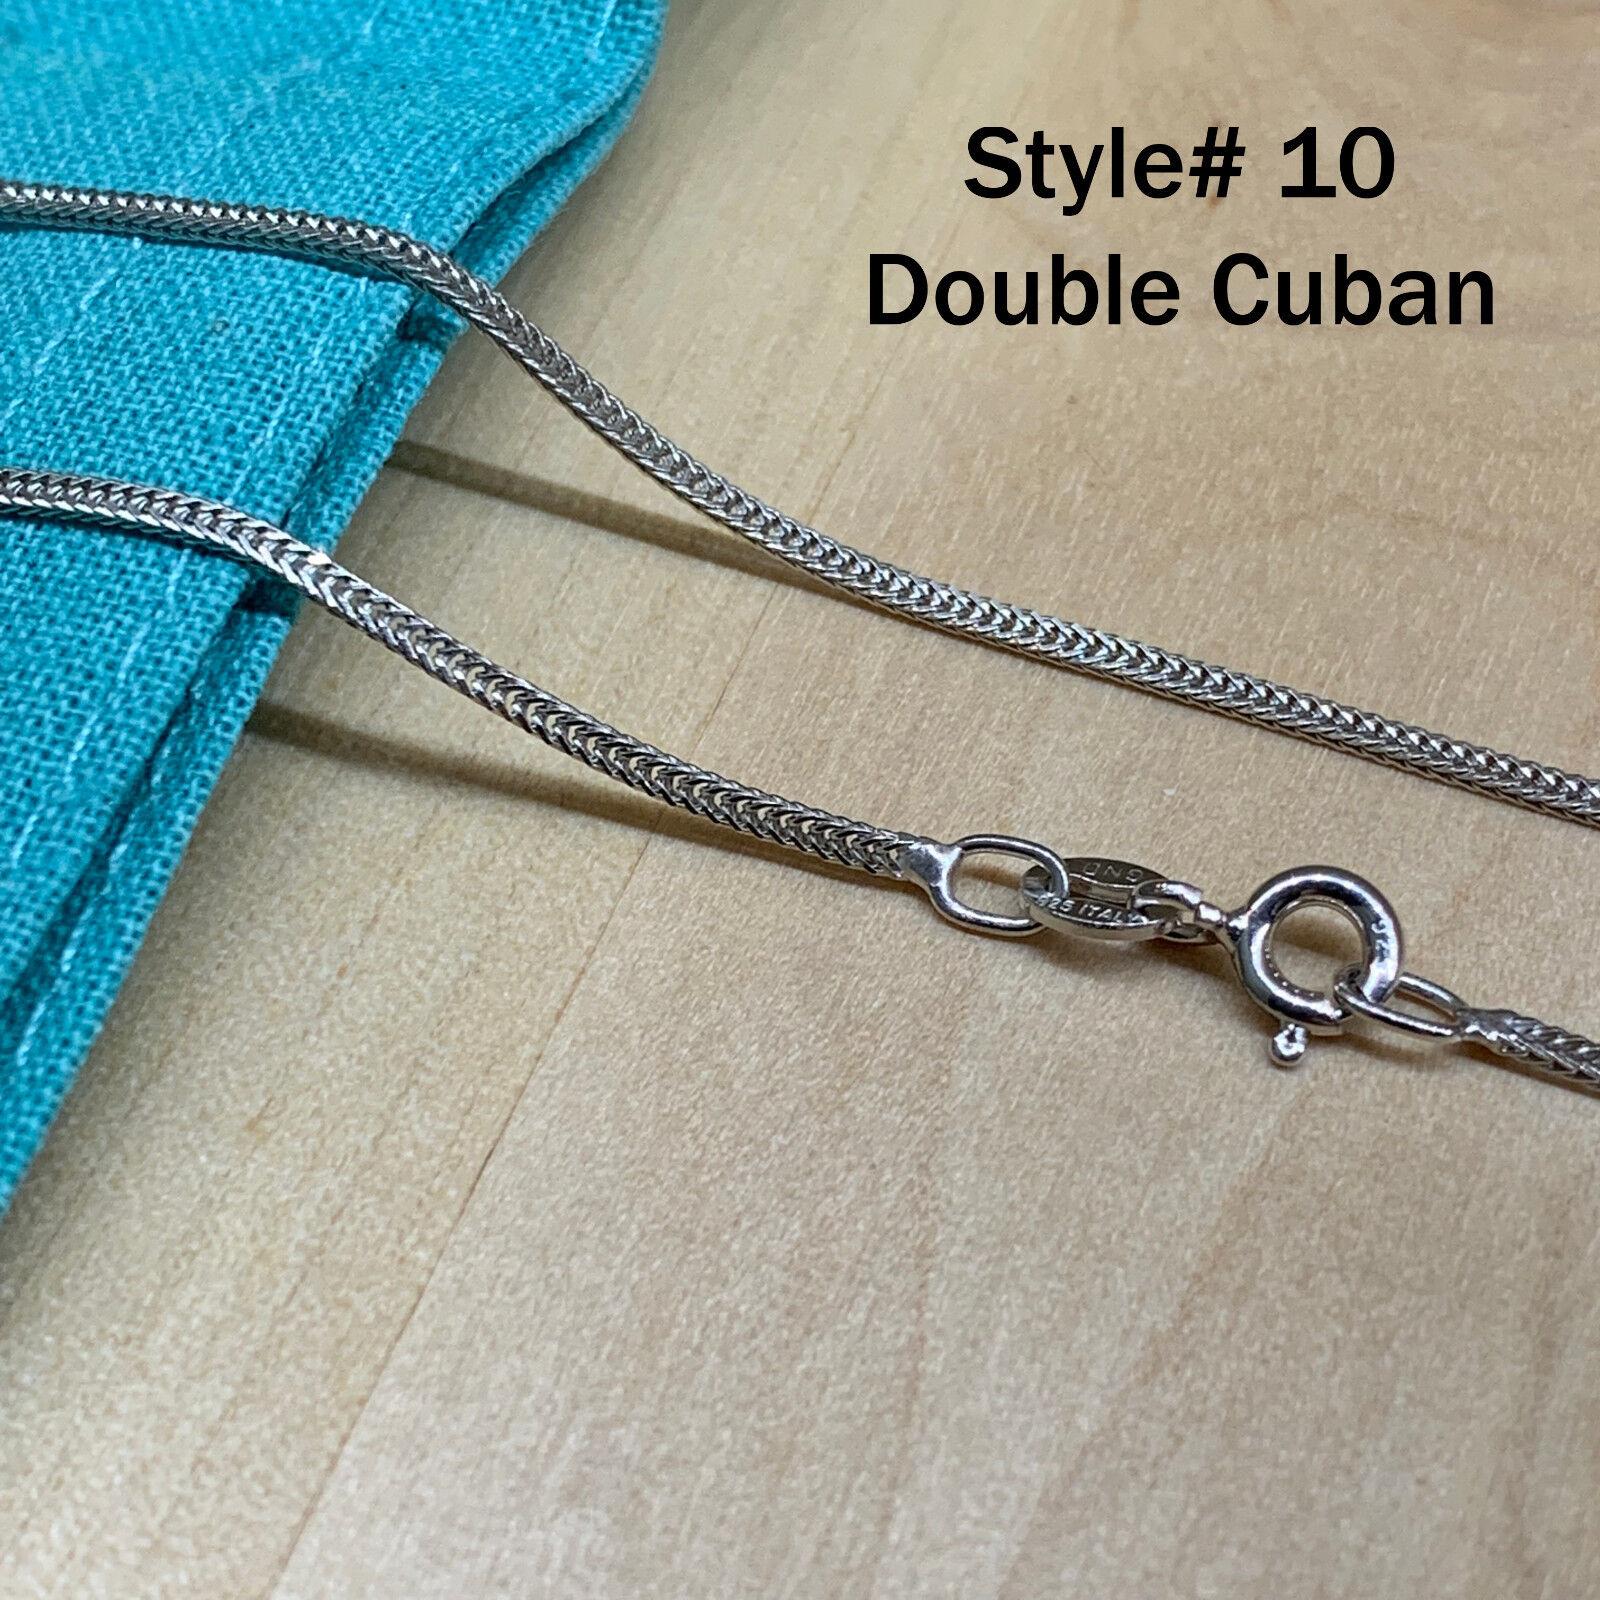 10 - Double Cuban